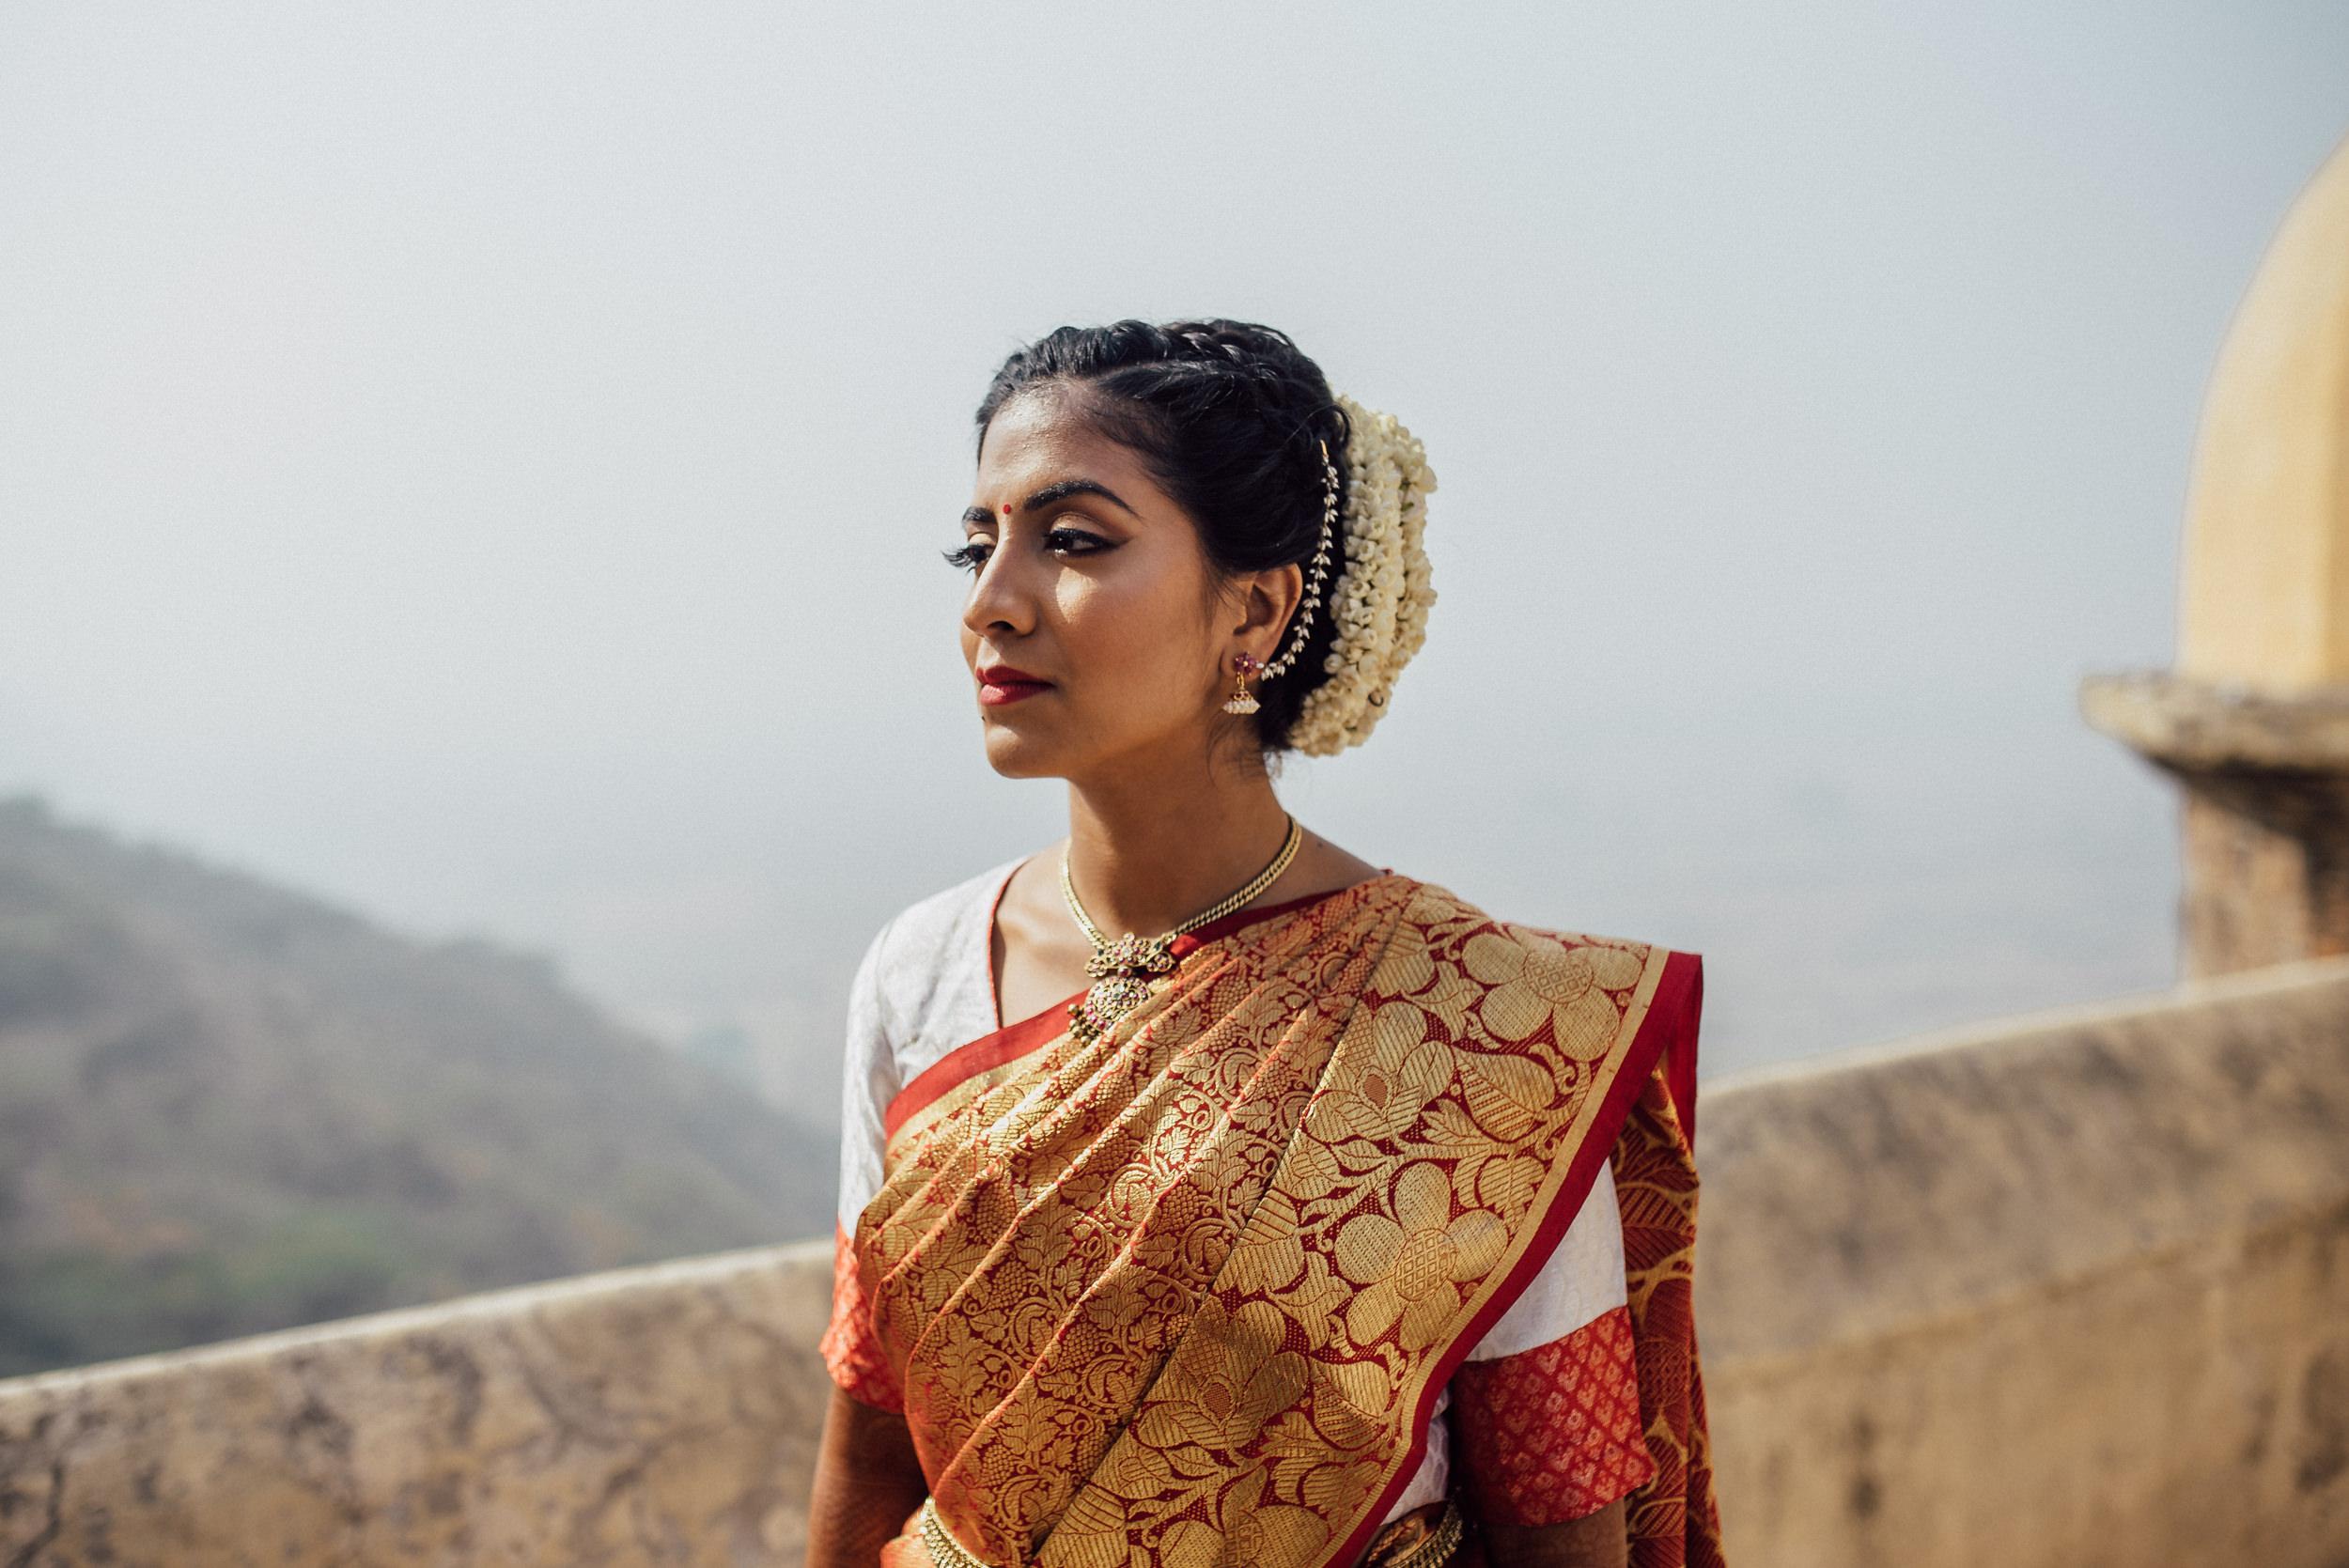 LiatAharoni-India-31.jpg